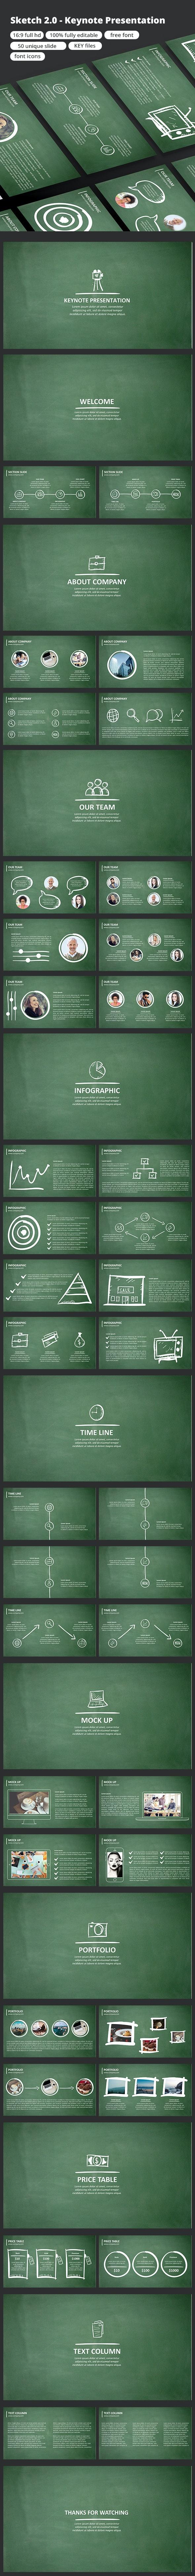 Sketch 2.0 - Keynote Presentation - Business Keynote Templates